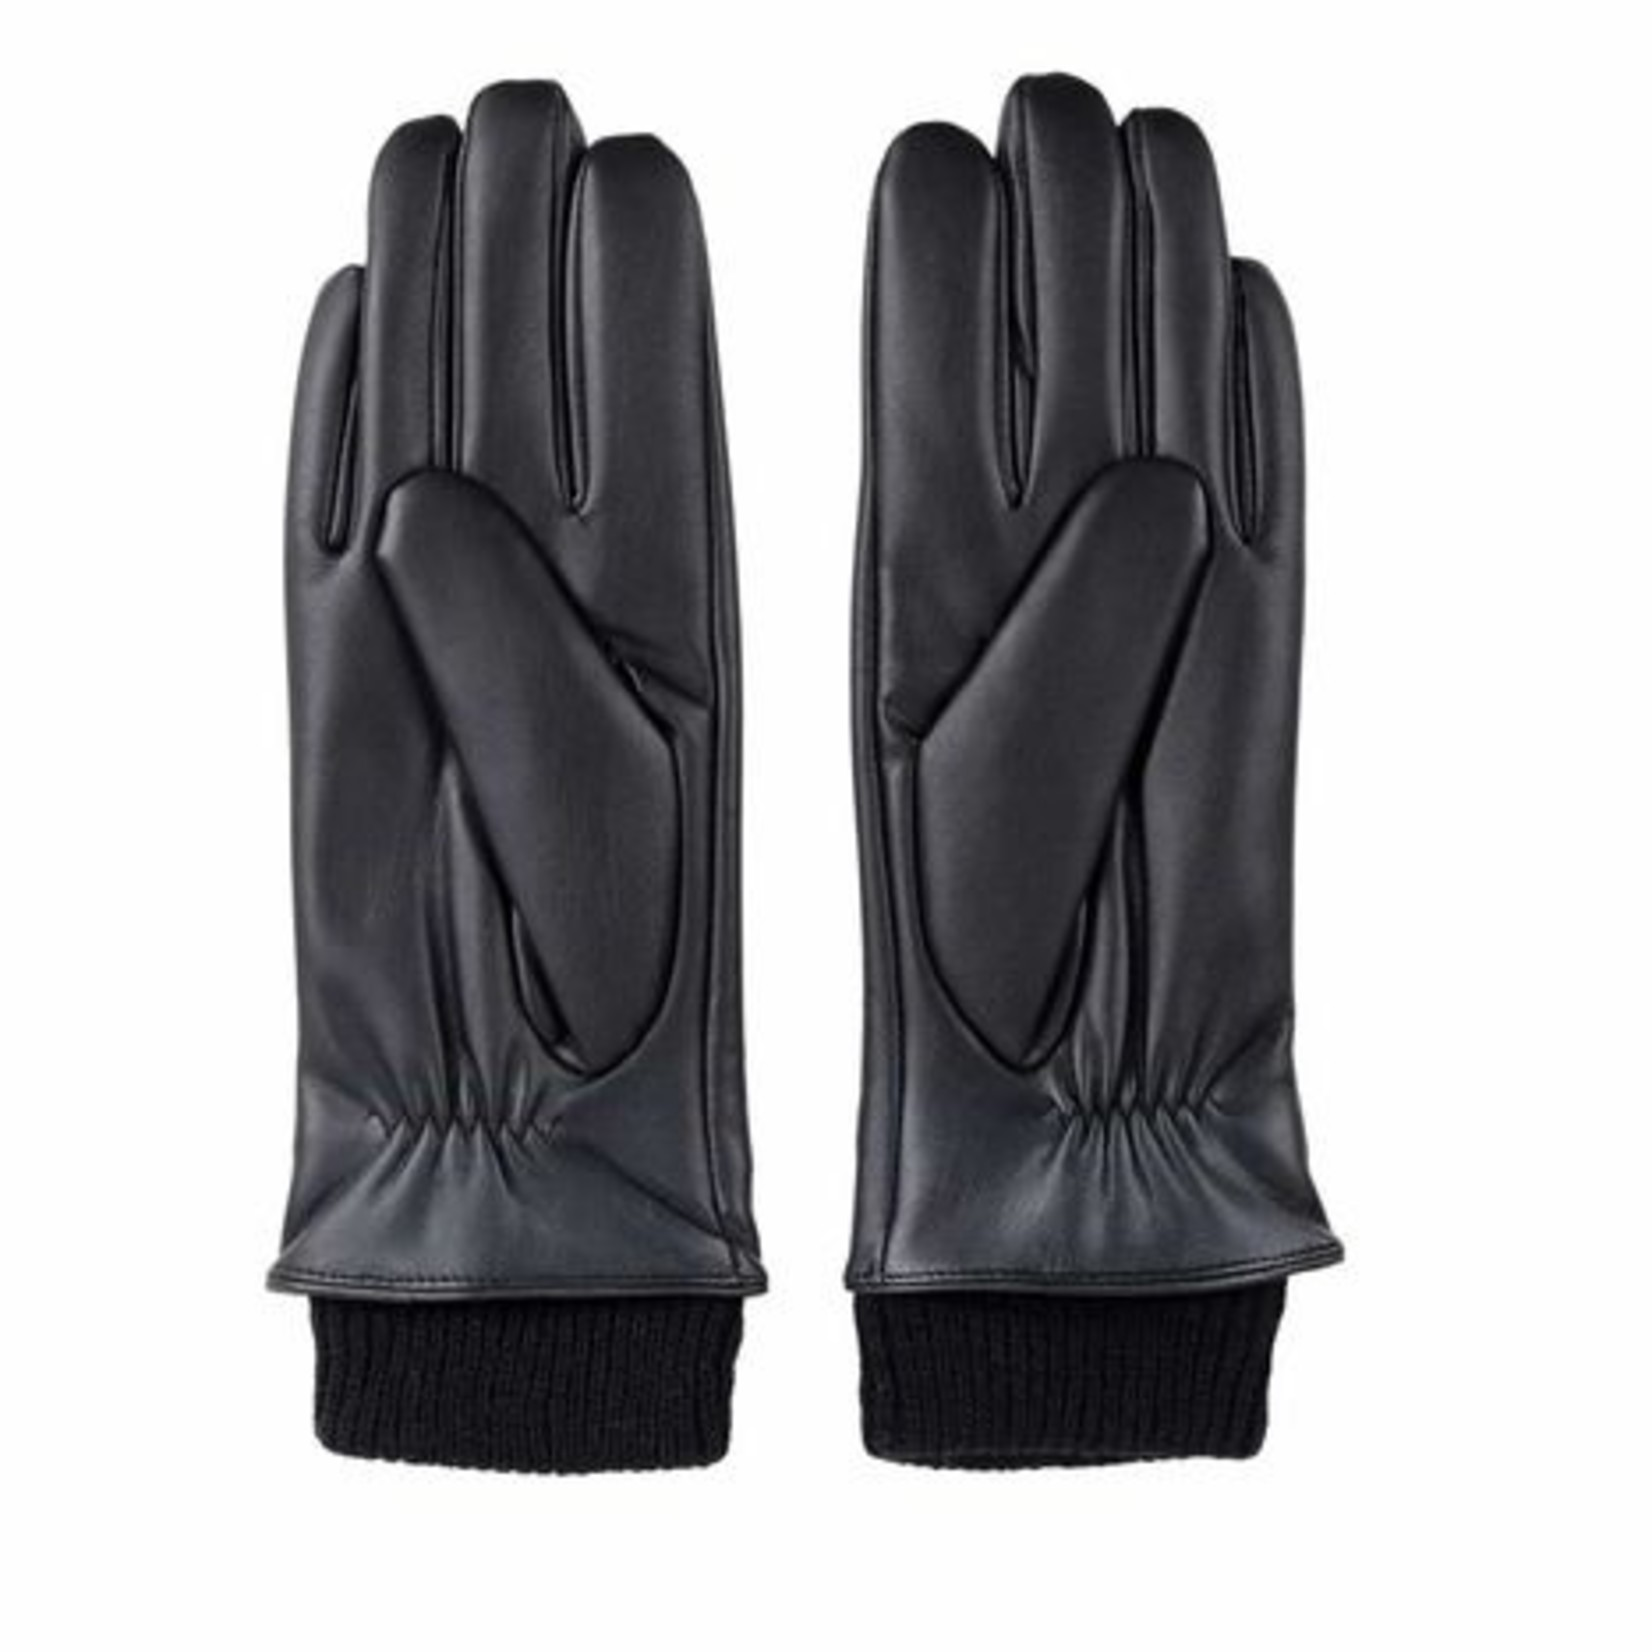 Zusss Handschoen - Chique - Zwart